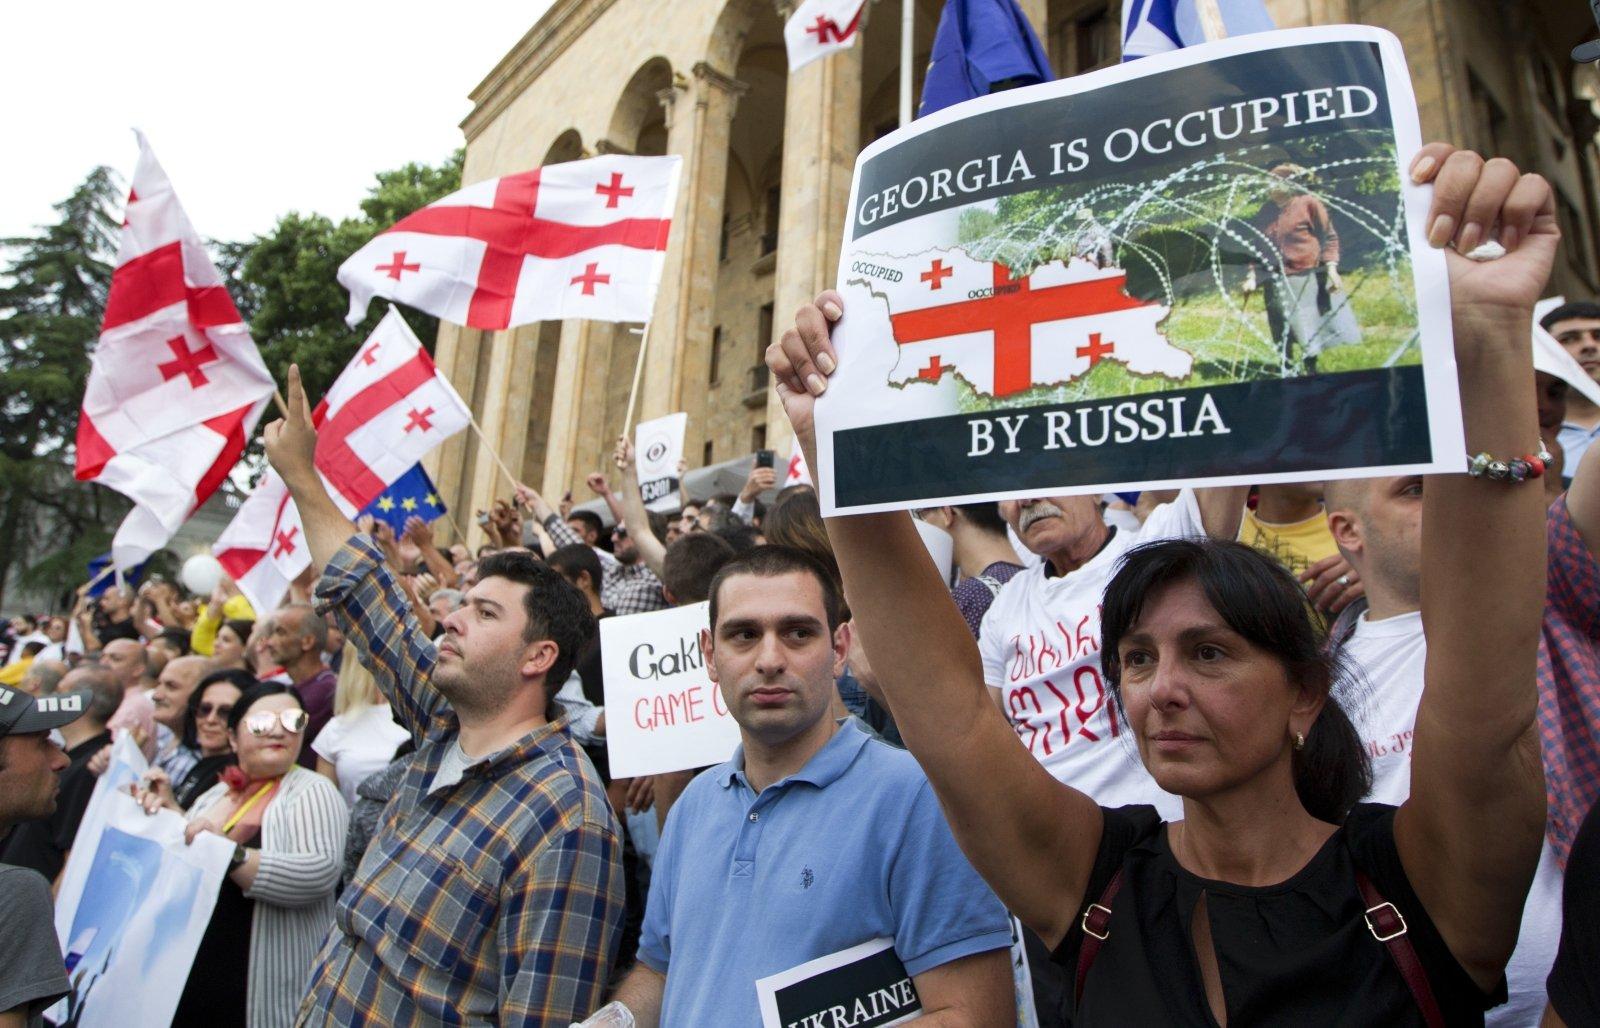 https://g1.dcdn.lt/images/pix/protesto-eitynes-tbilisyje-81594327.jpg